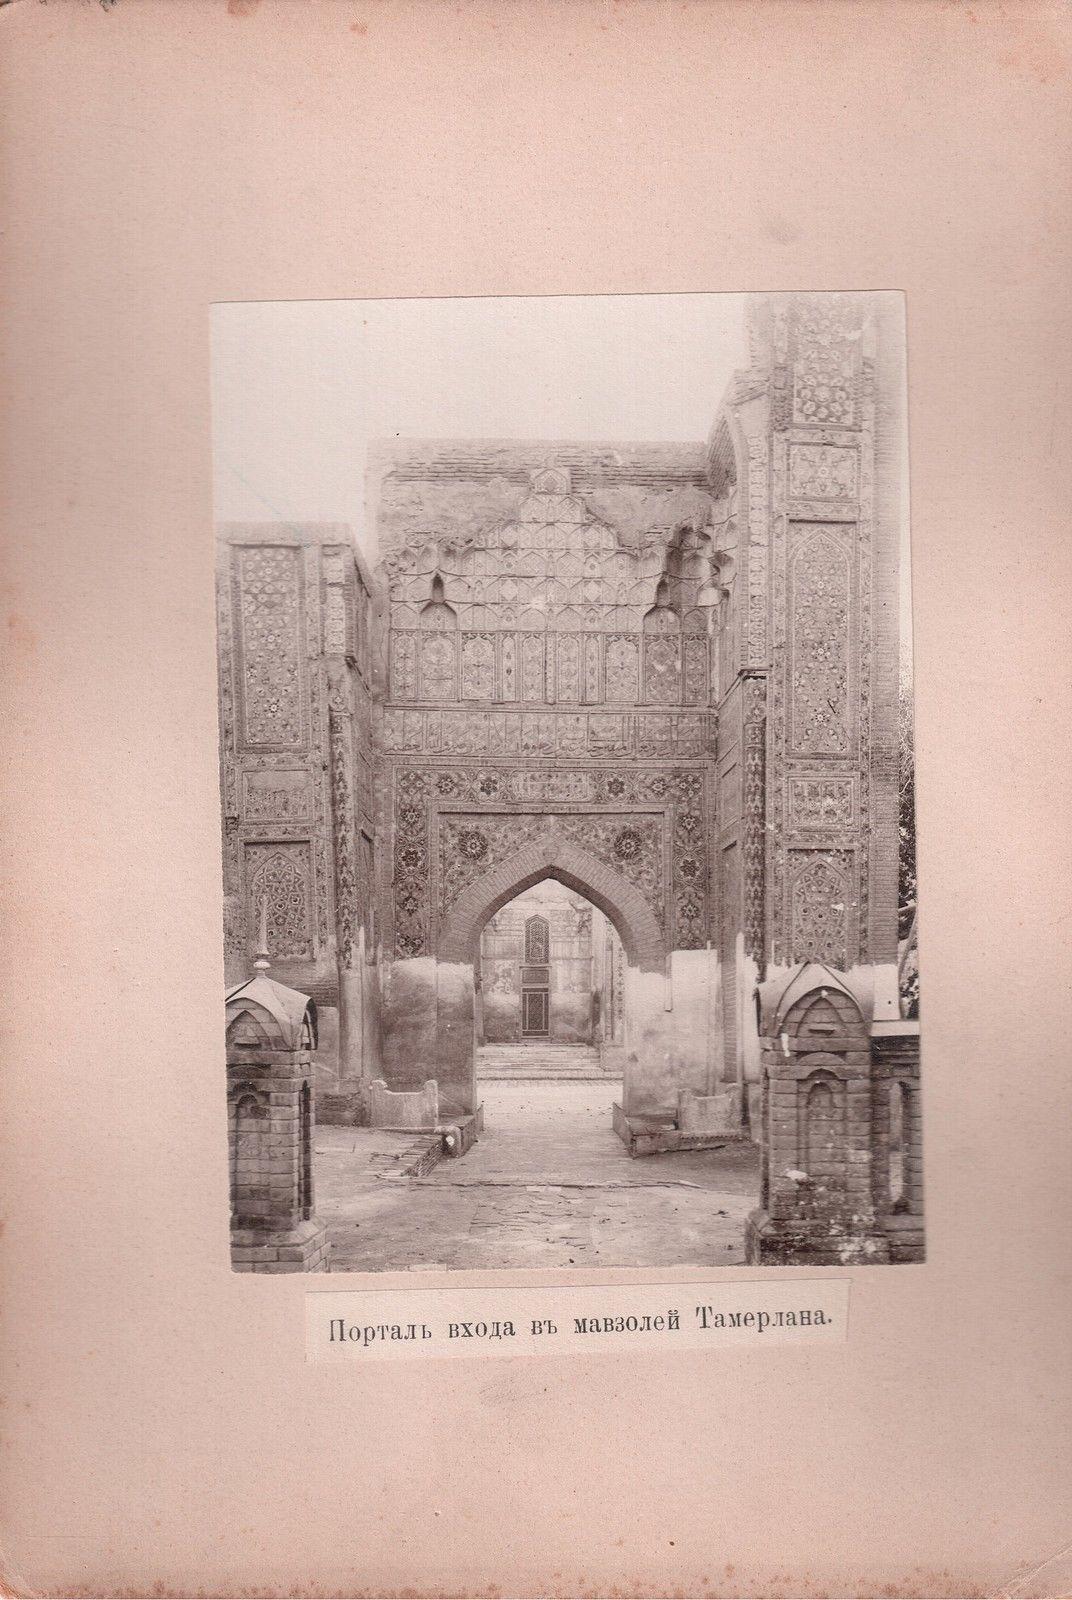 Гур-Эмир. Портал входа в мавзолей Тамерлана